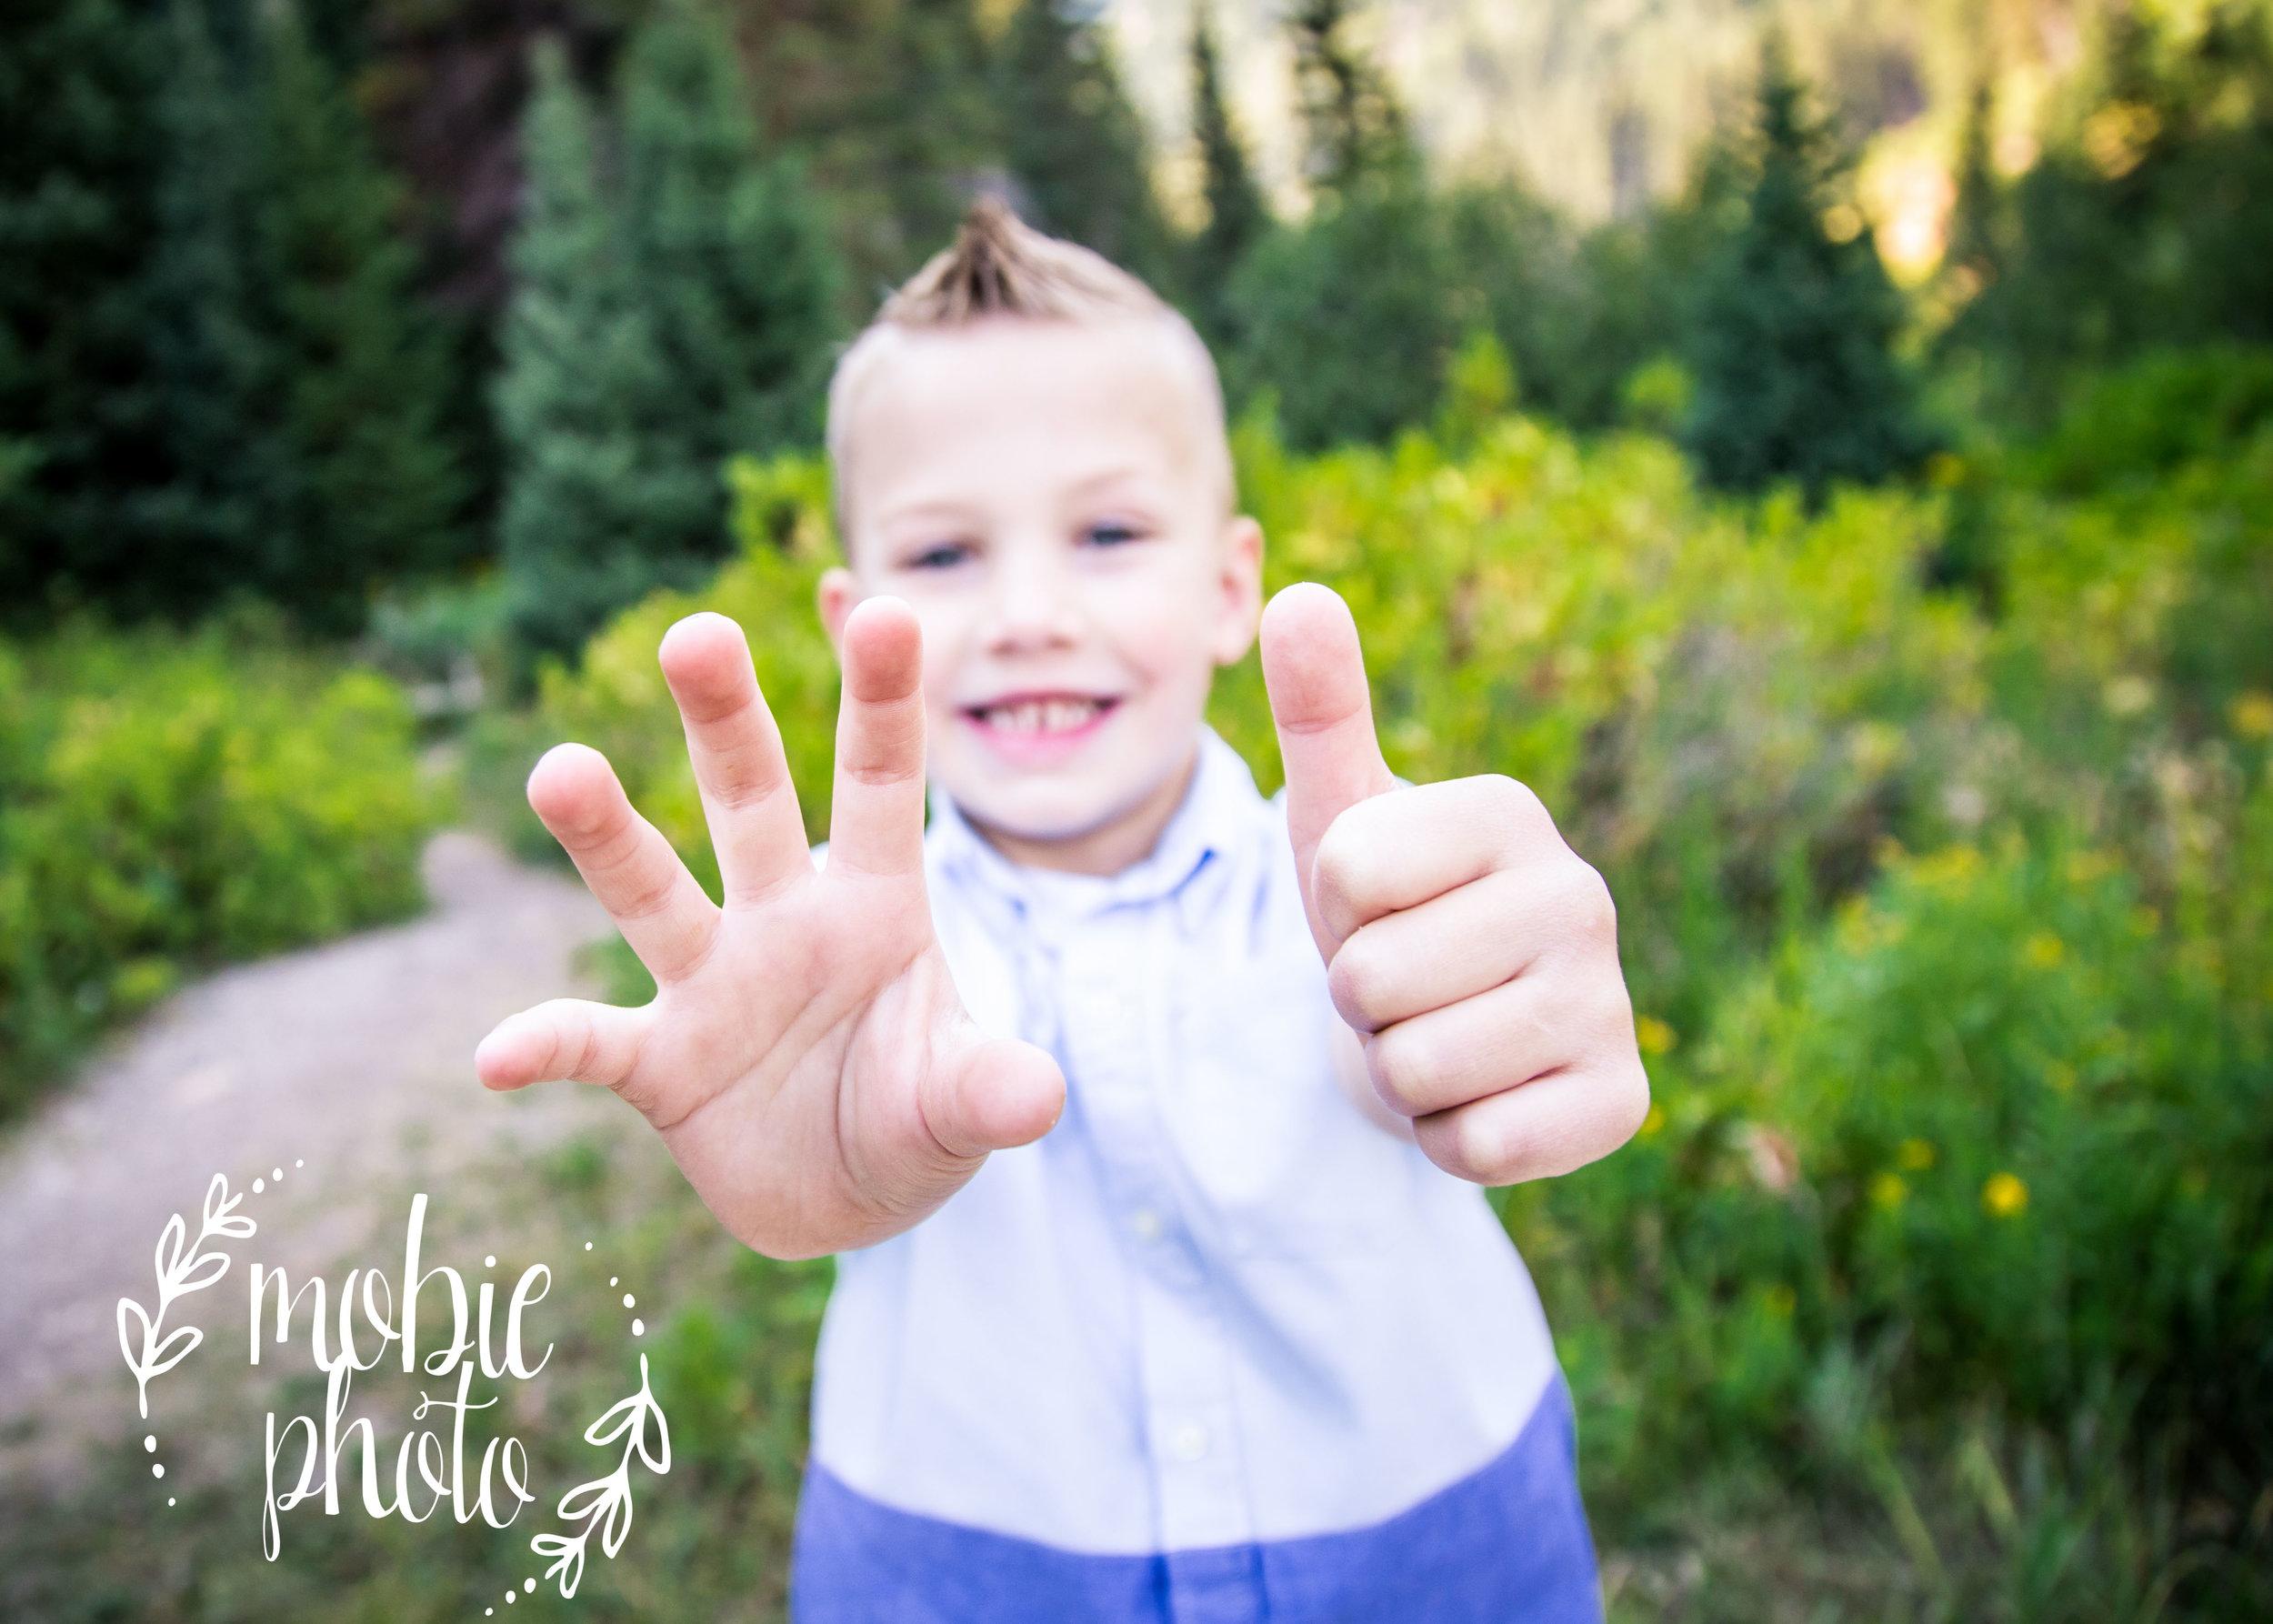 Mobie Photo - Salt Lake City Photographer - Big Cottonwood Canyon, August 2016